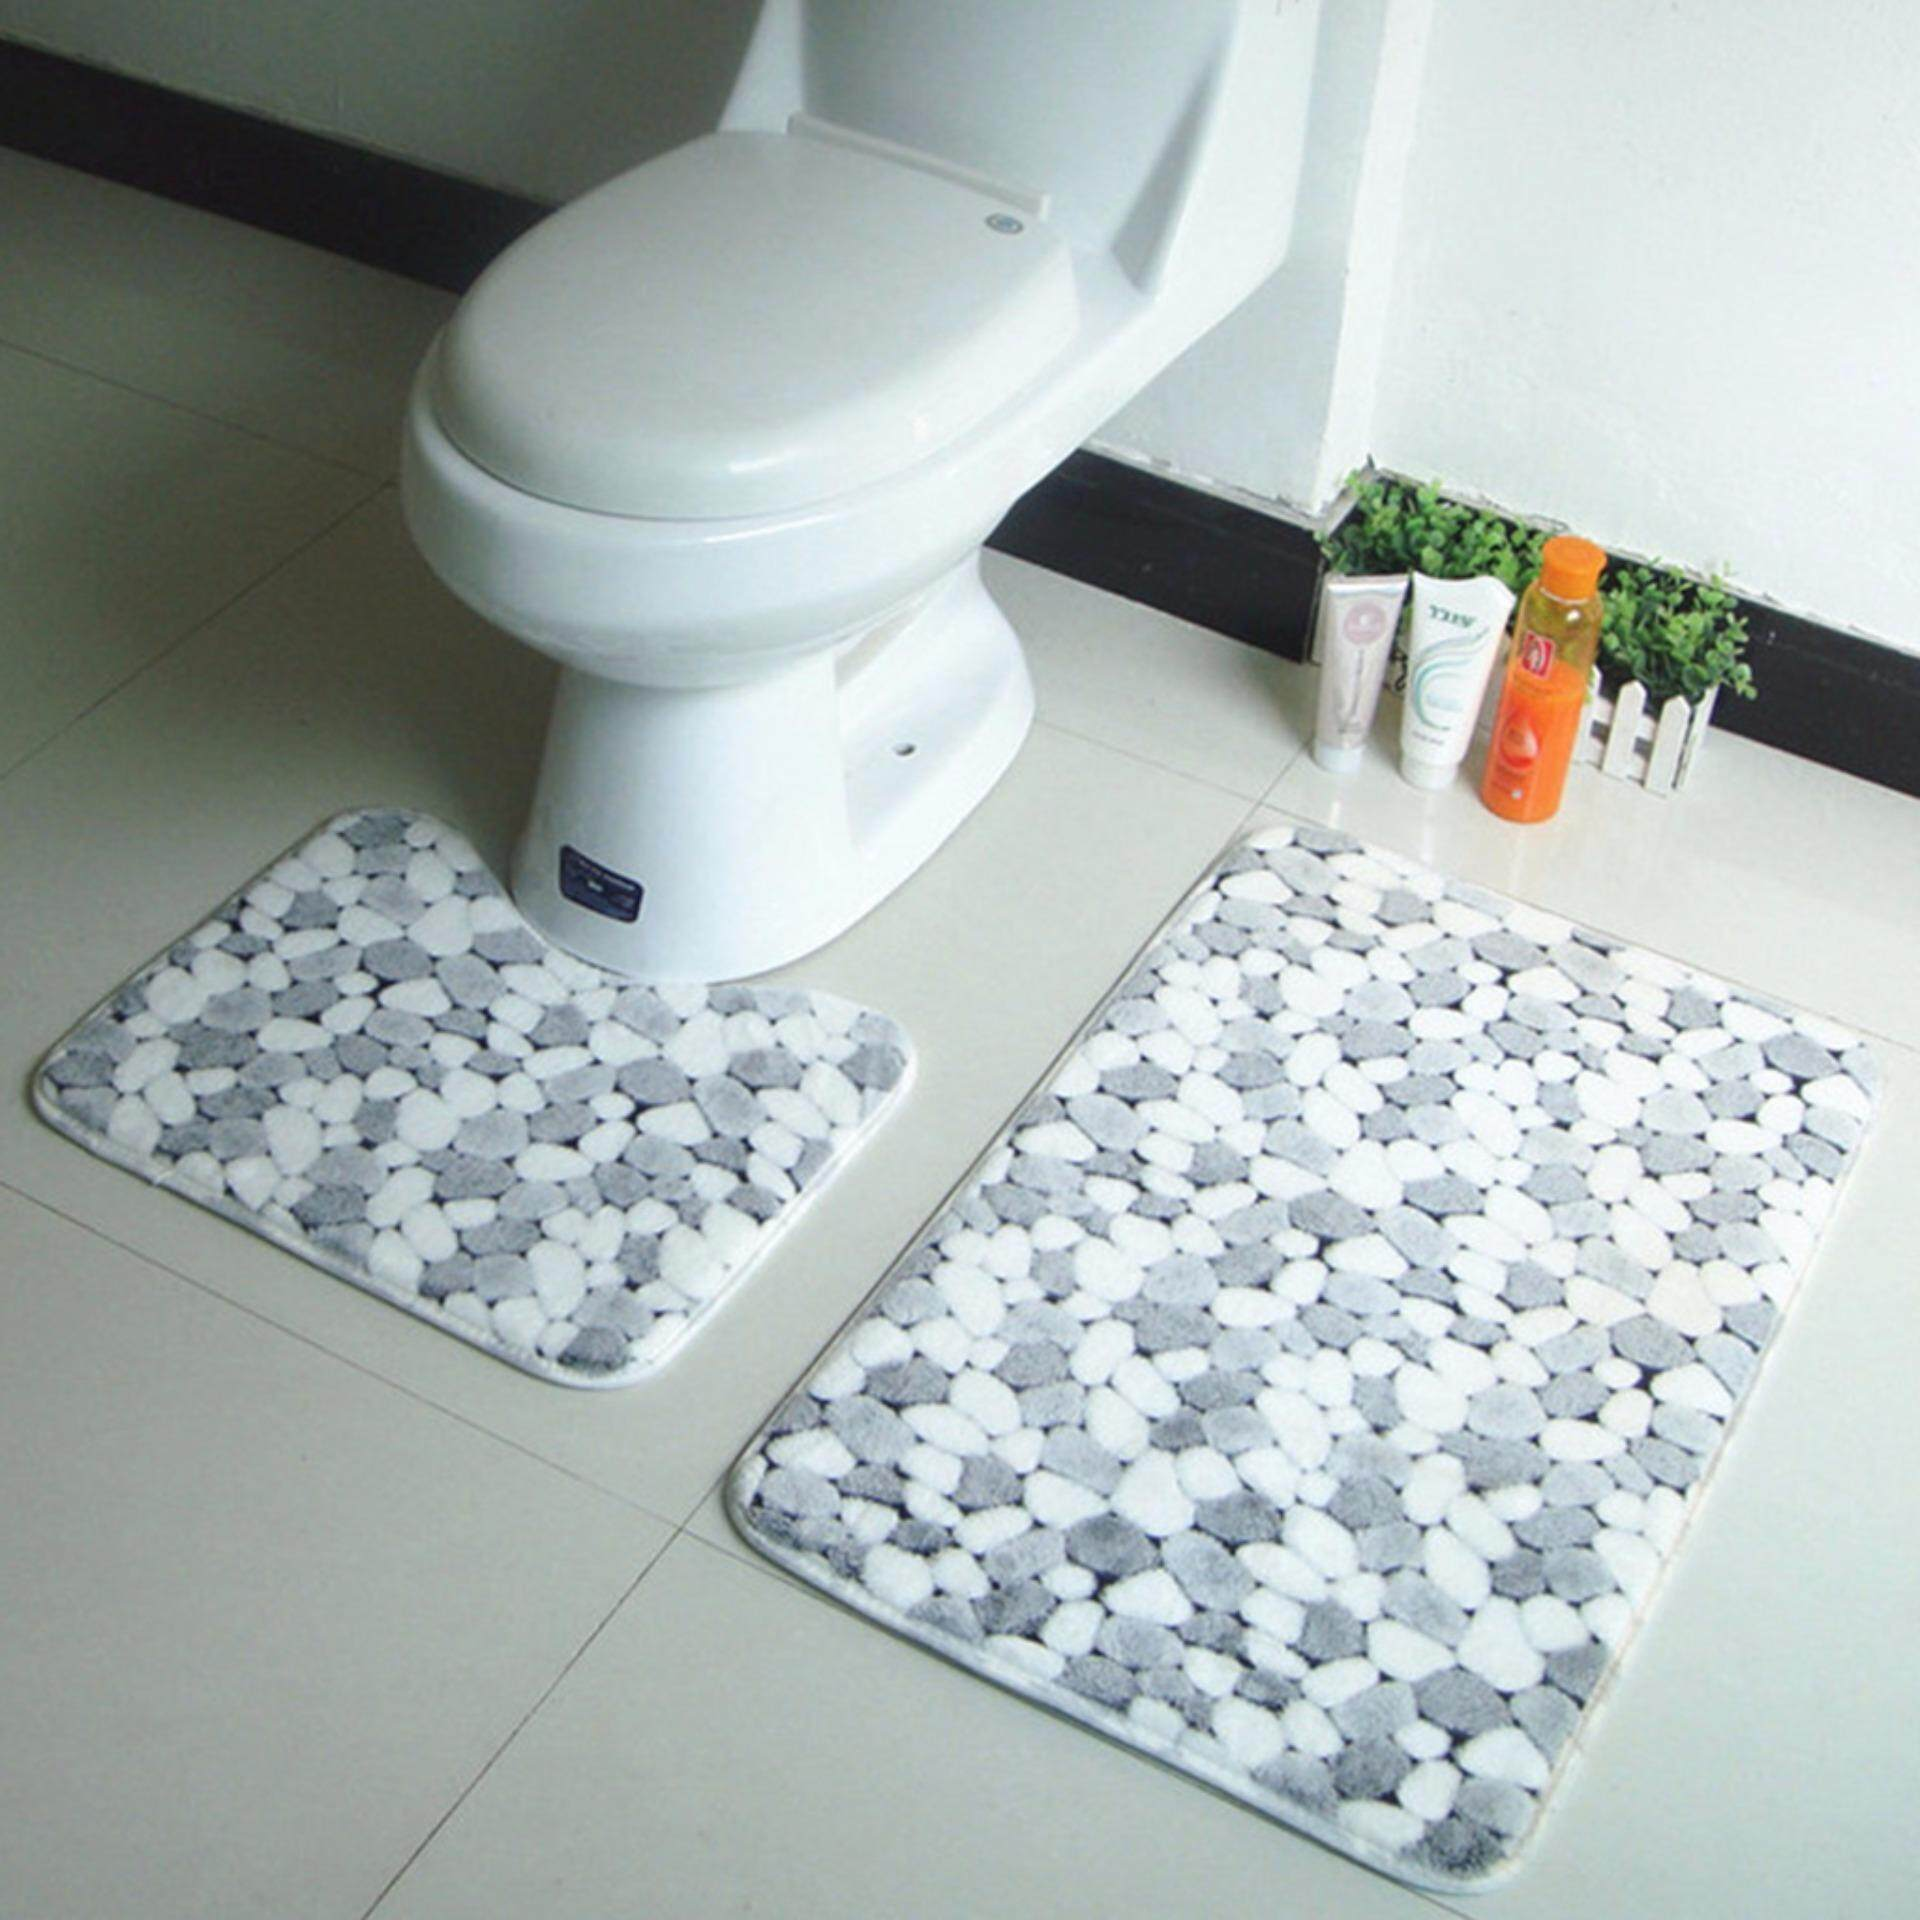 Pelacakan Harga Set 2 Lembut Karang Bulu Toilet Tidak Tergelincir Mandi Tikar Alas Lantai Karpet-Internasional periksa peringkat - Hanya Rp121.164